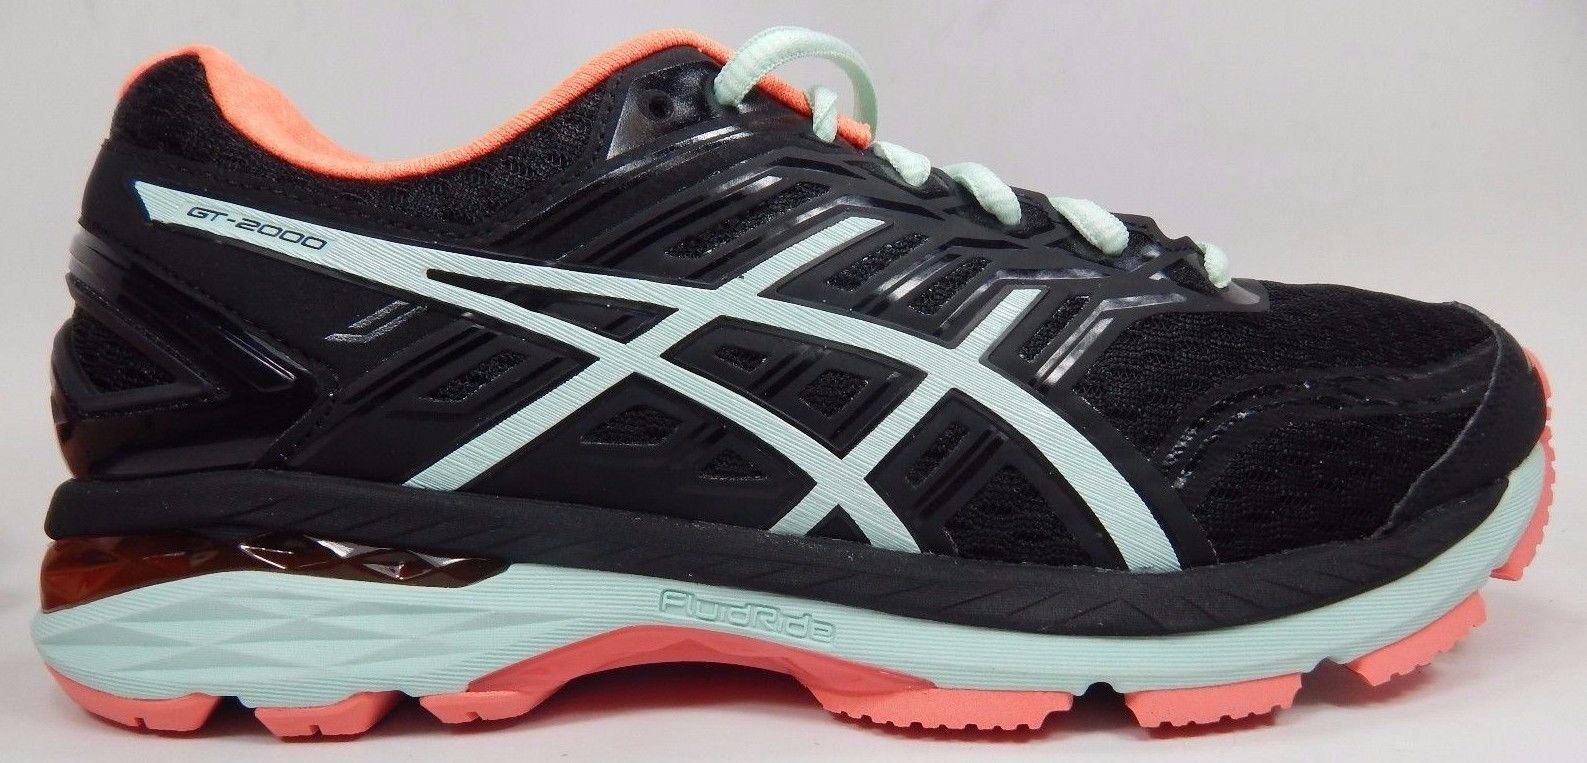 Asics GT 2000 v 5 Women's Running Shoes Size US 9 M (B) EU 40.5 Black T757N